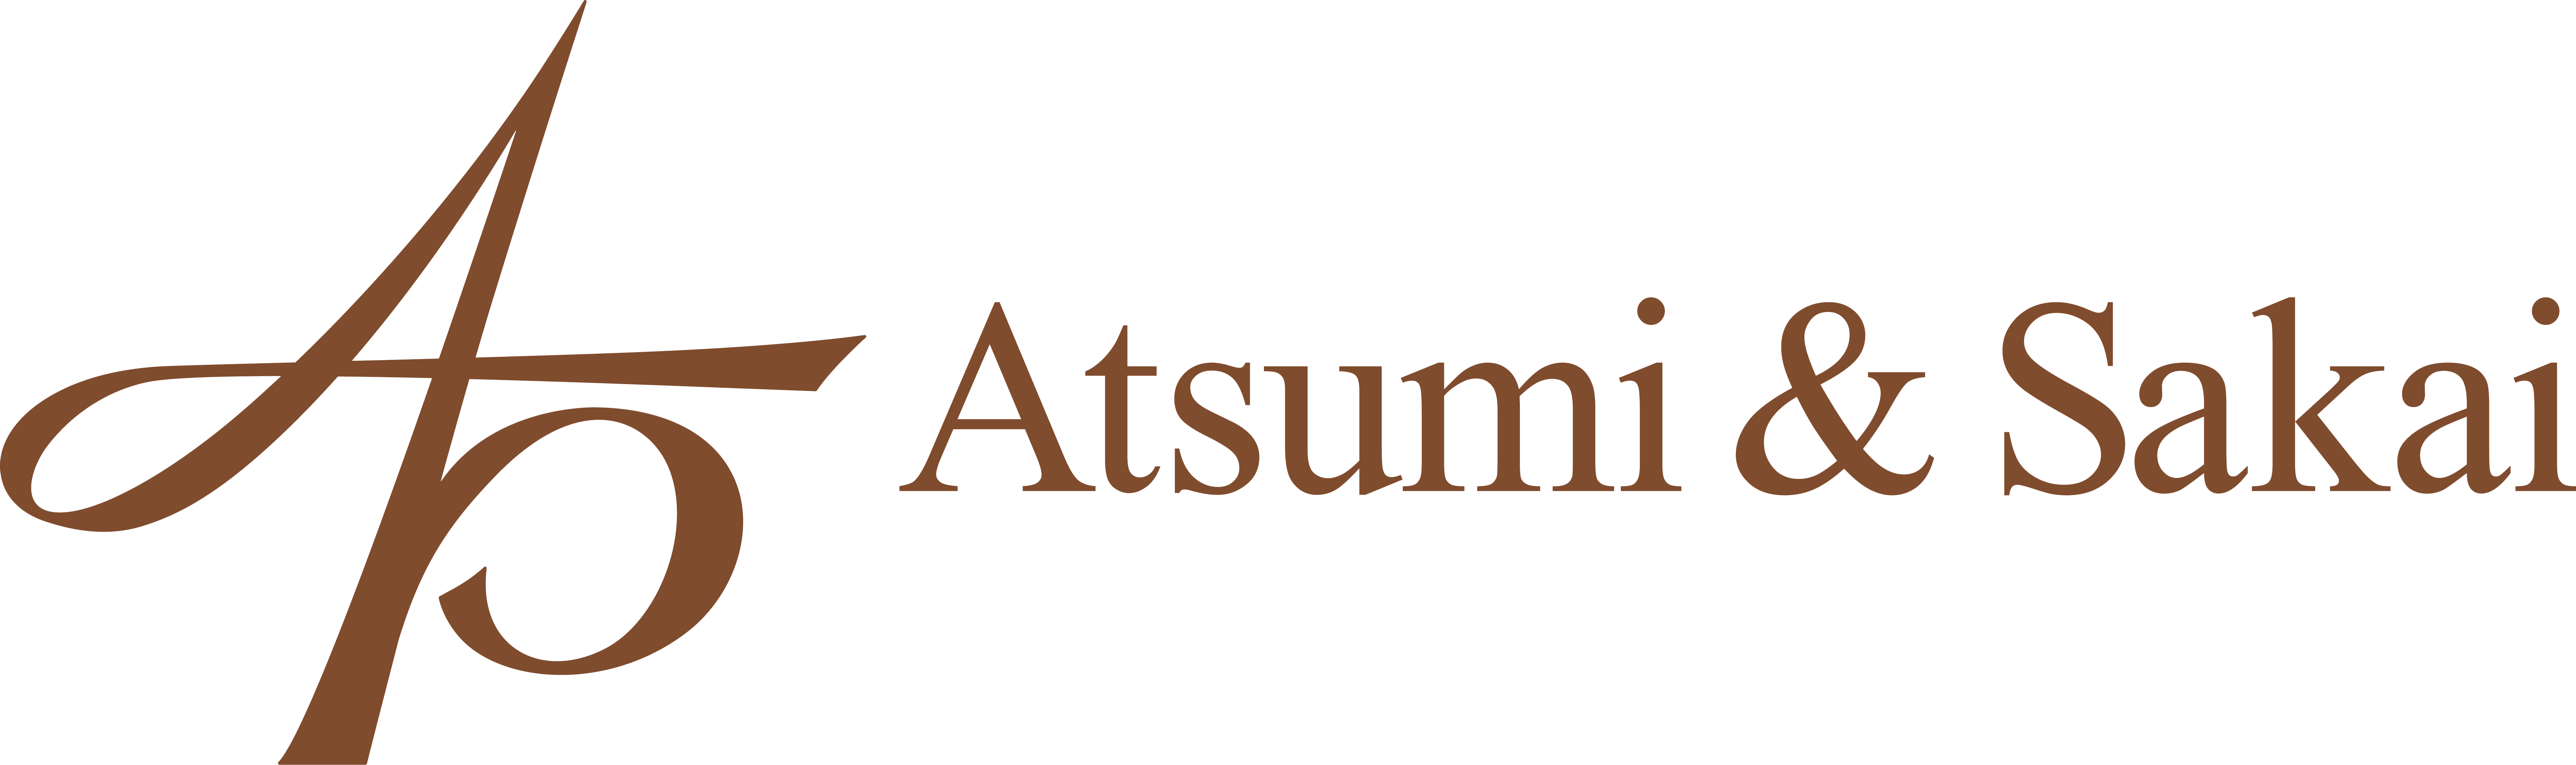 Atsumi & Sakai